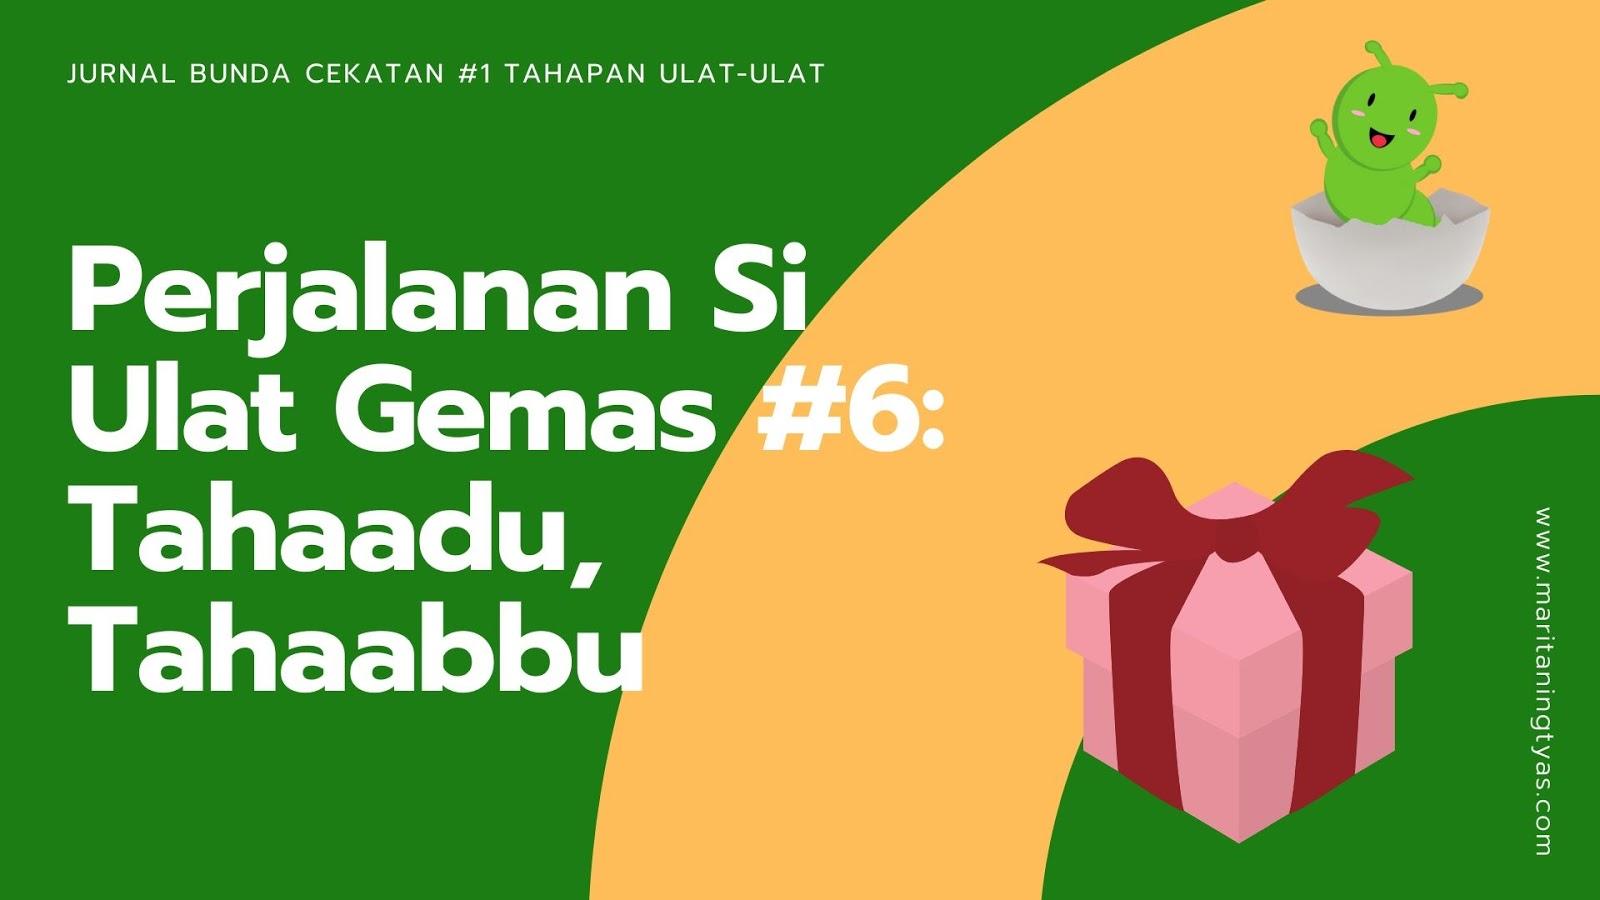 Perjalanan Si Ulat Gemas #6 Bunda Cekatan: Tahaadu, Tahaabbu